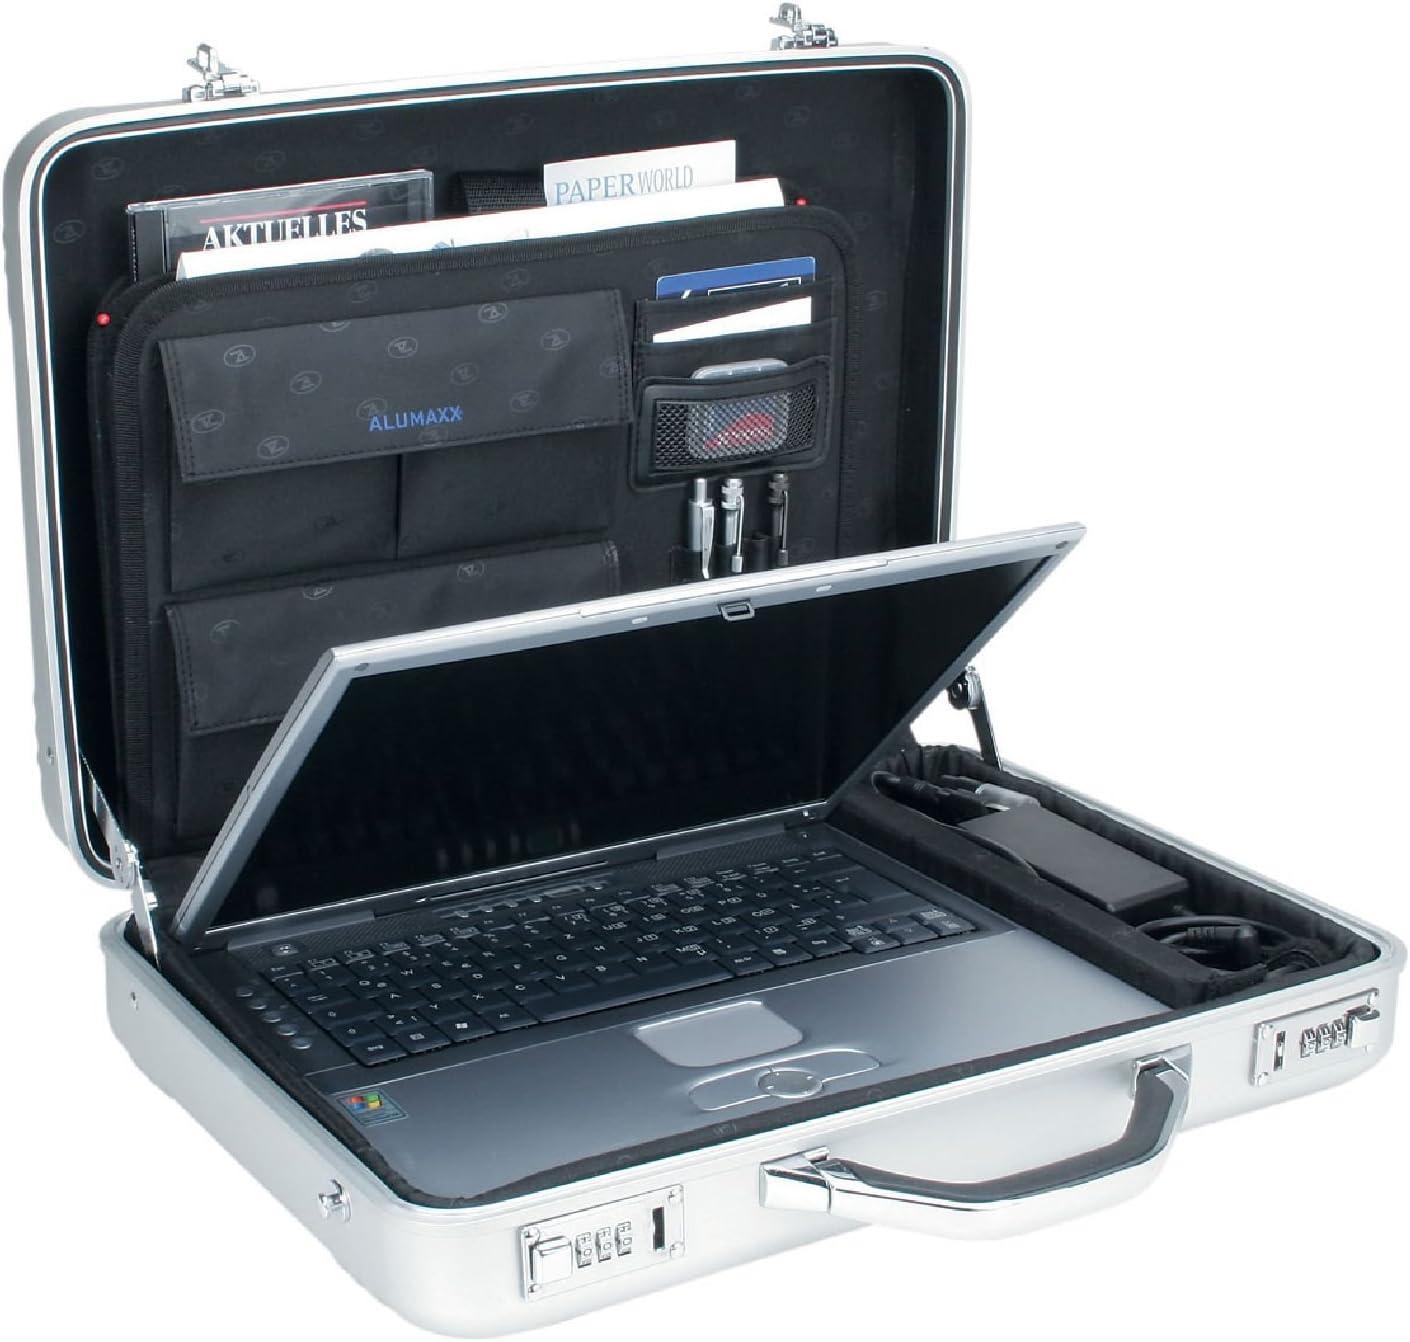 ALUMAXX Laptop Attachékoffer MERCATO Aktenkoffer Laptop Alu Koffer Aluminium silber 45188 Alumaxx©